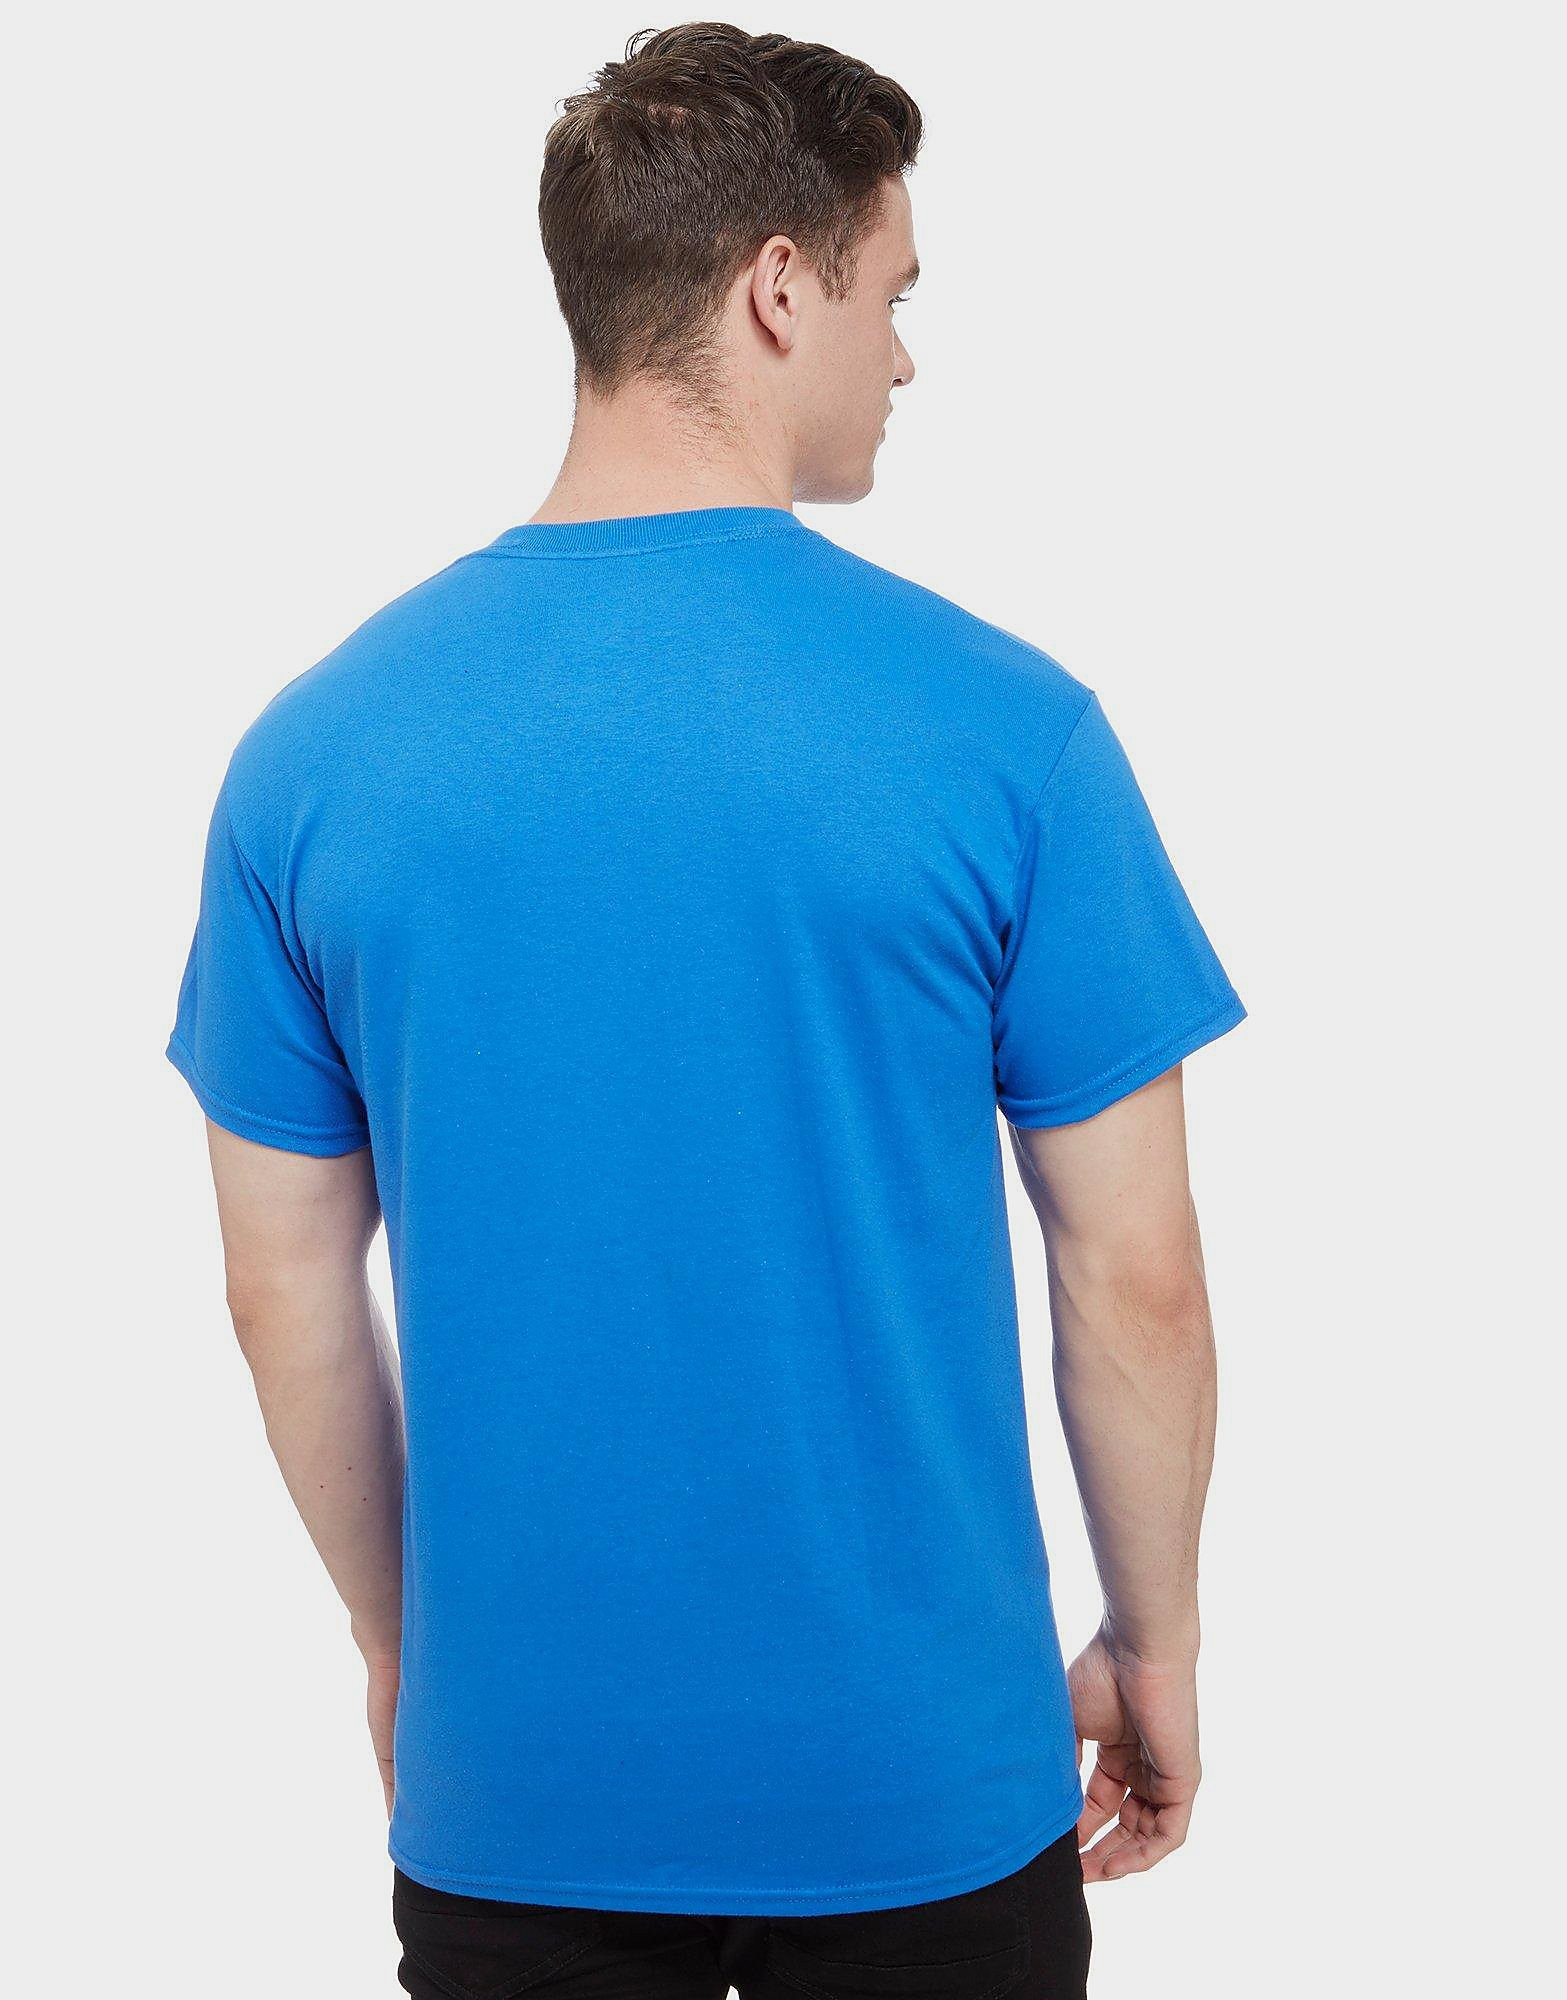 Official Team Chelsea FC Kings T-Shirt